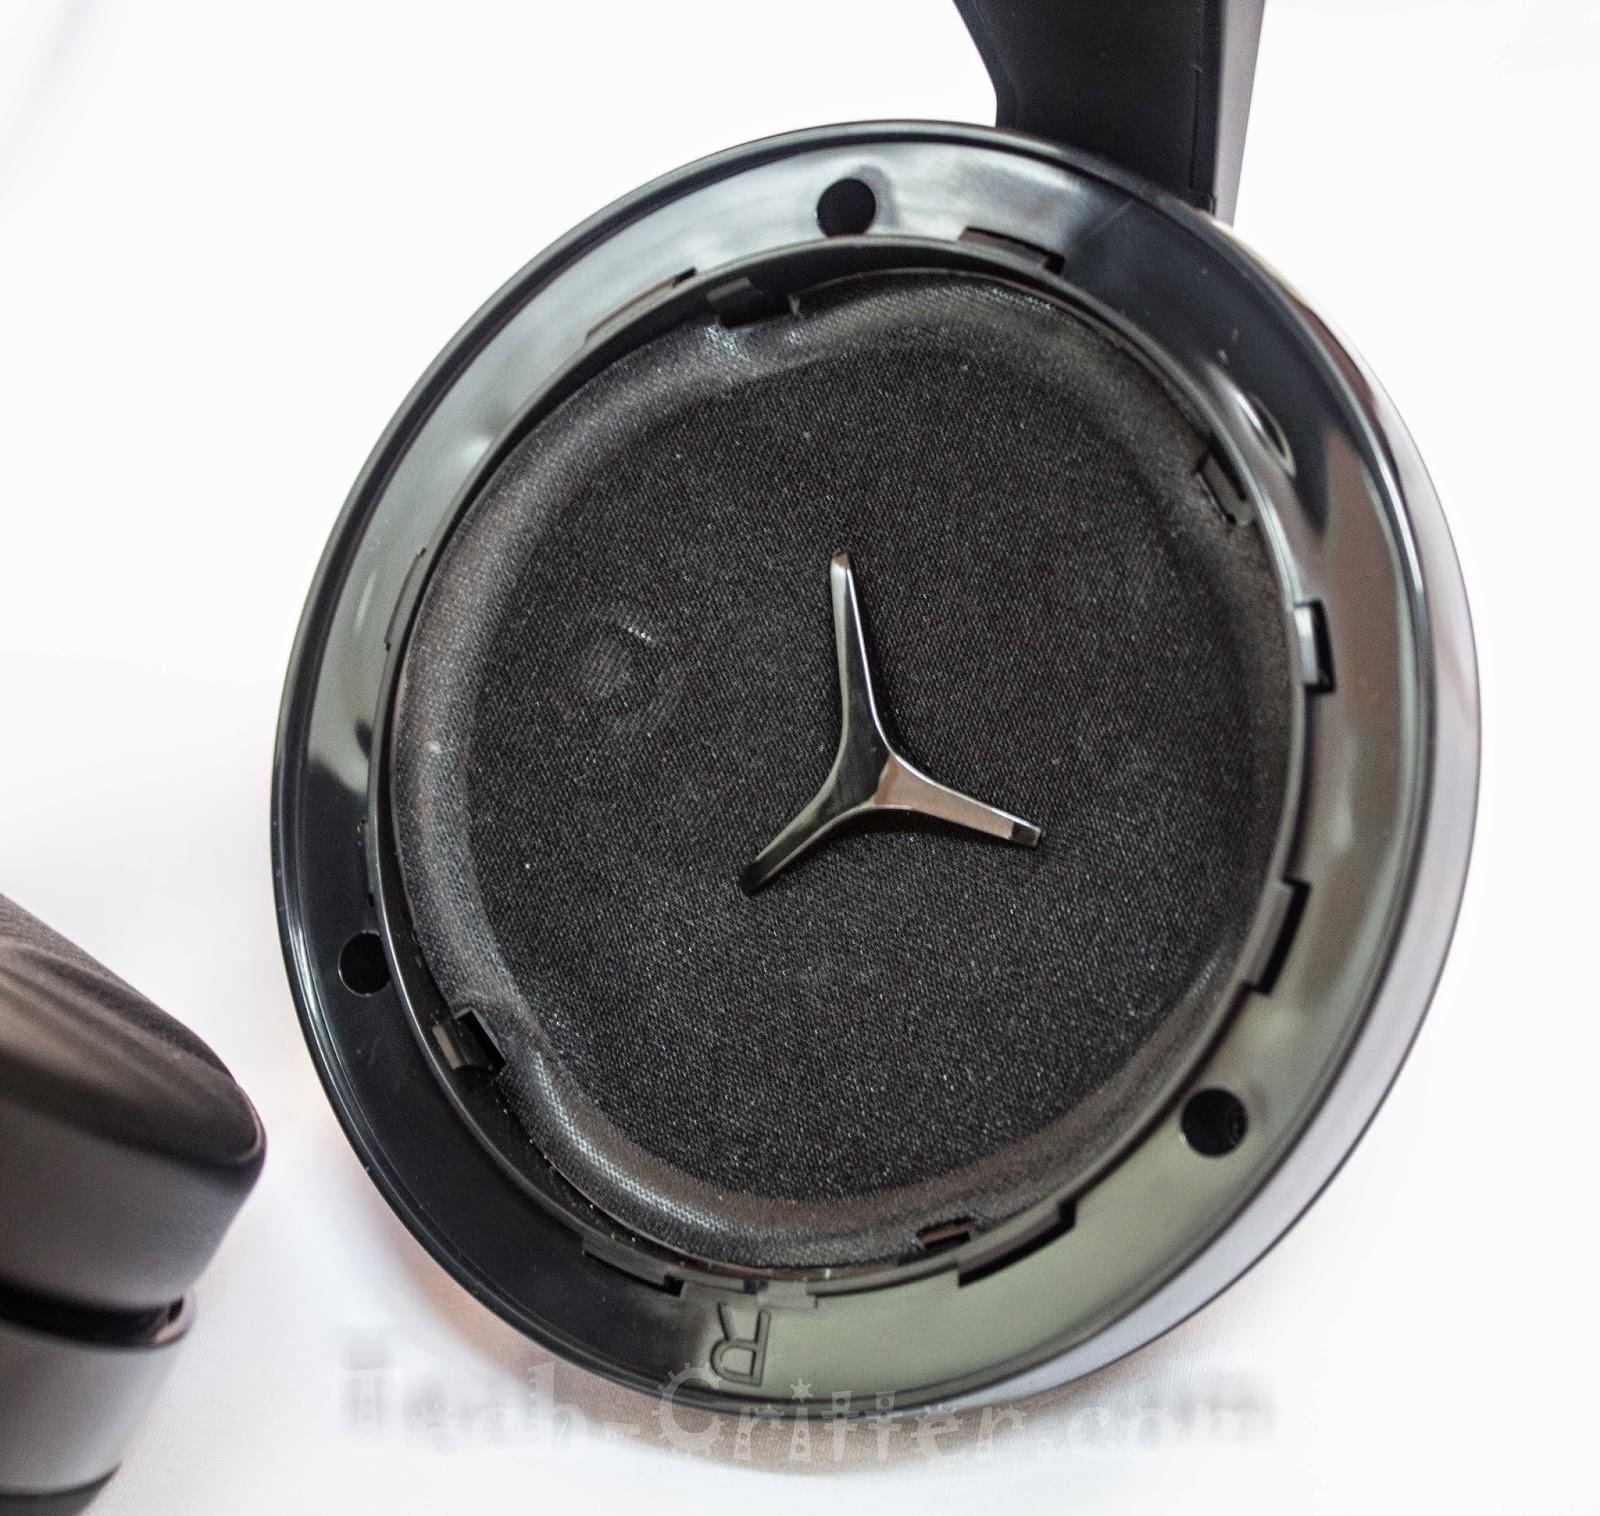 Unboxing & Review: Roccat Kave XTD 5.1 Digital Surround Sound Headset 70